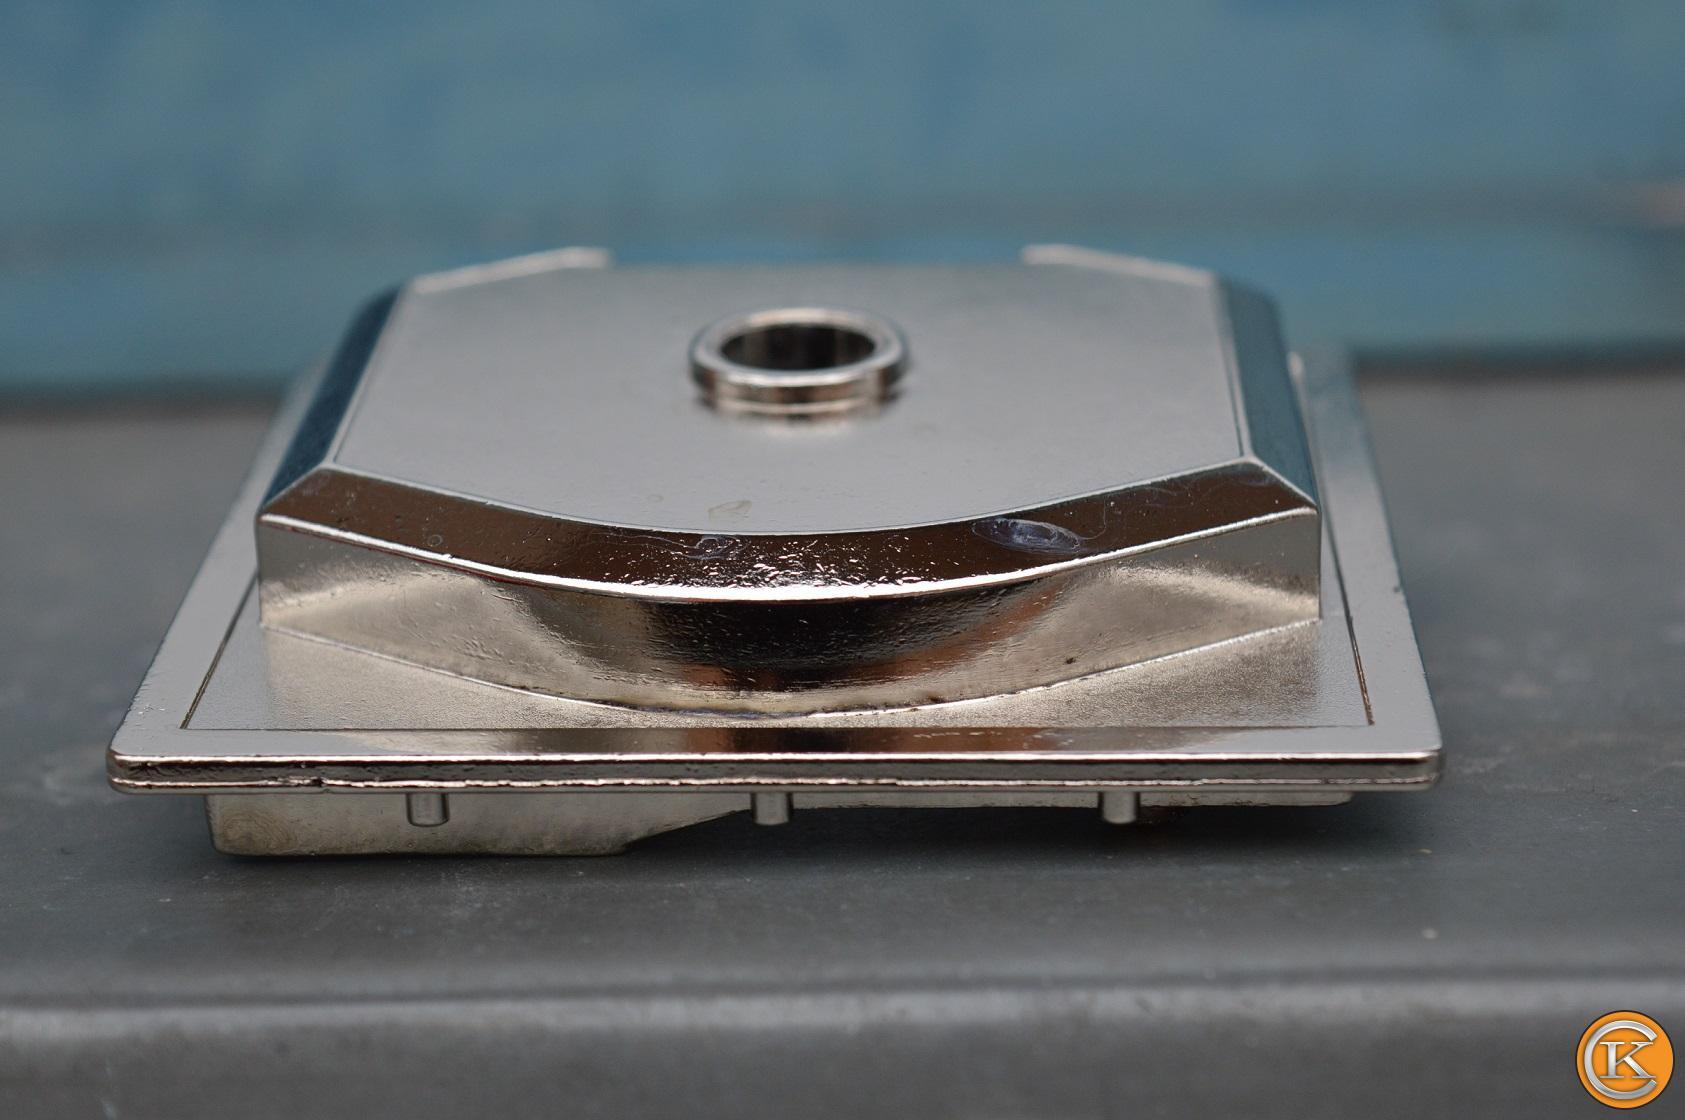 Nikkelezés galéria - Nikkelezett munkadarab